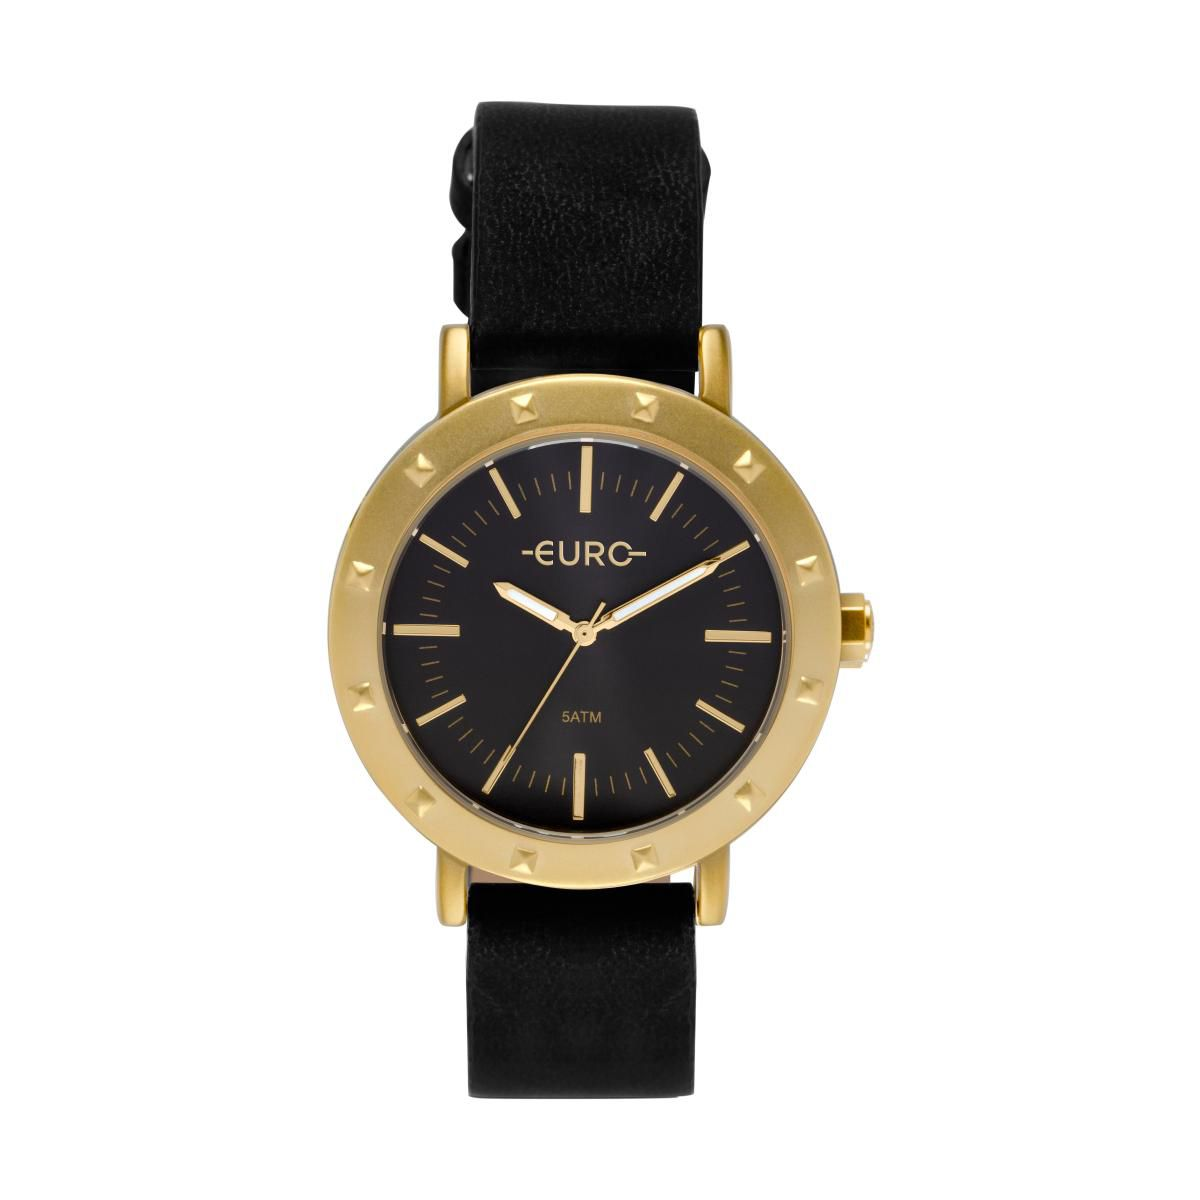 Relógio Feminino Euro EU2035YPI/2P 40mm Couro Sintetico Preto